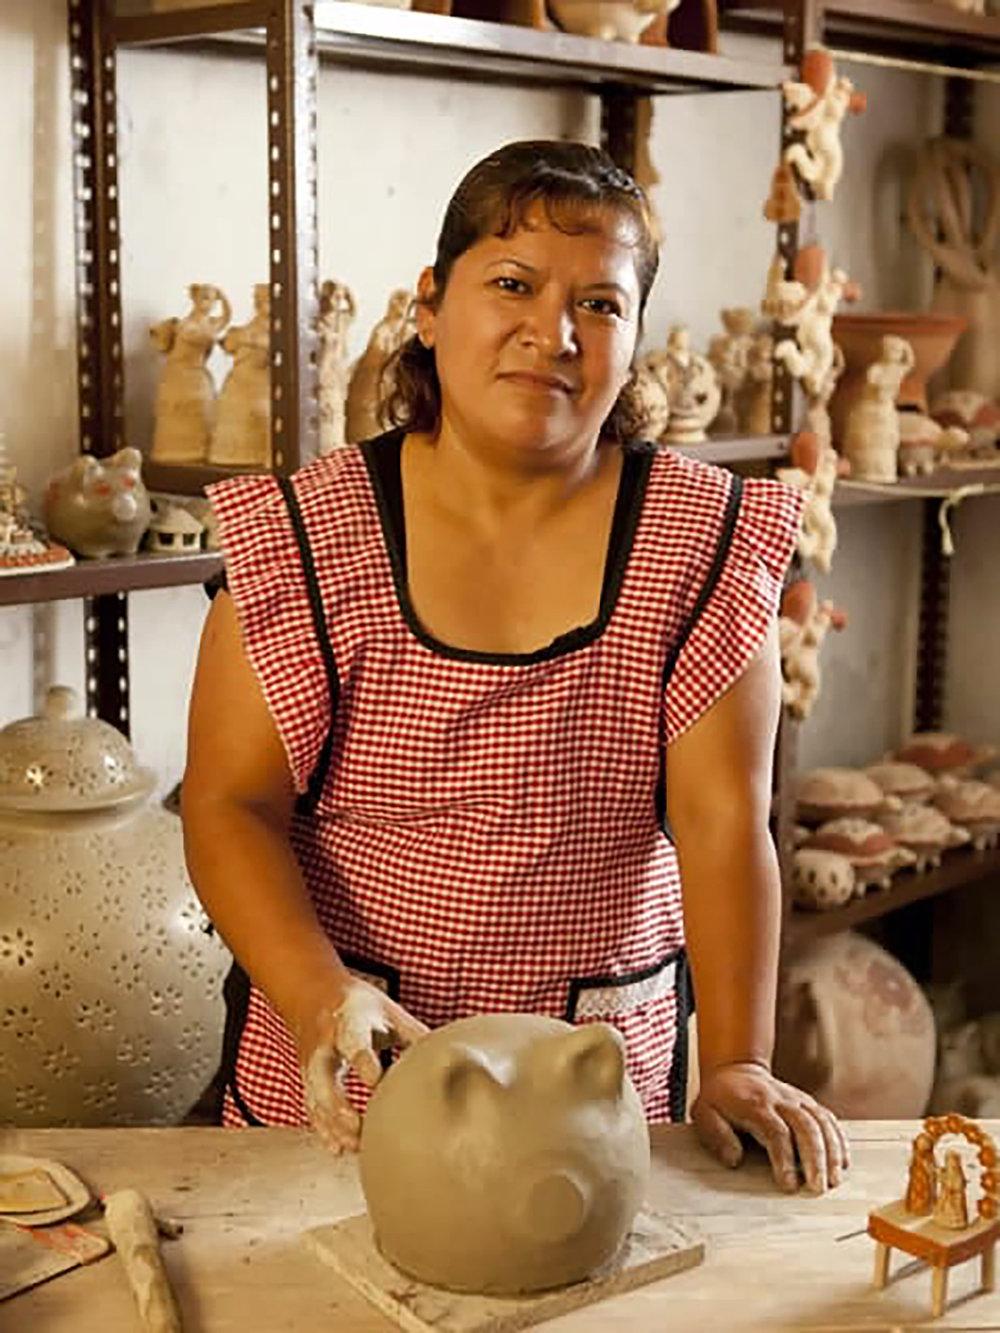 Figure 18: Carmen Gutierrez Vazquez, San Miguel Aguasuelos, Veracruz-Mexico. Photo courtesy of Cactus Fine Art.